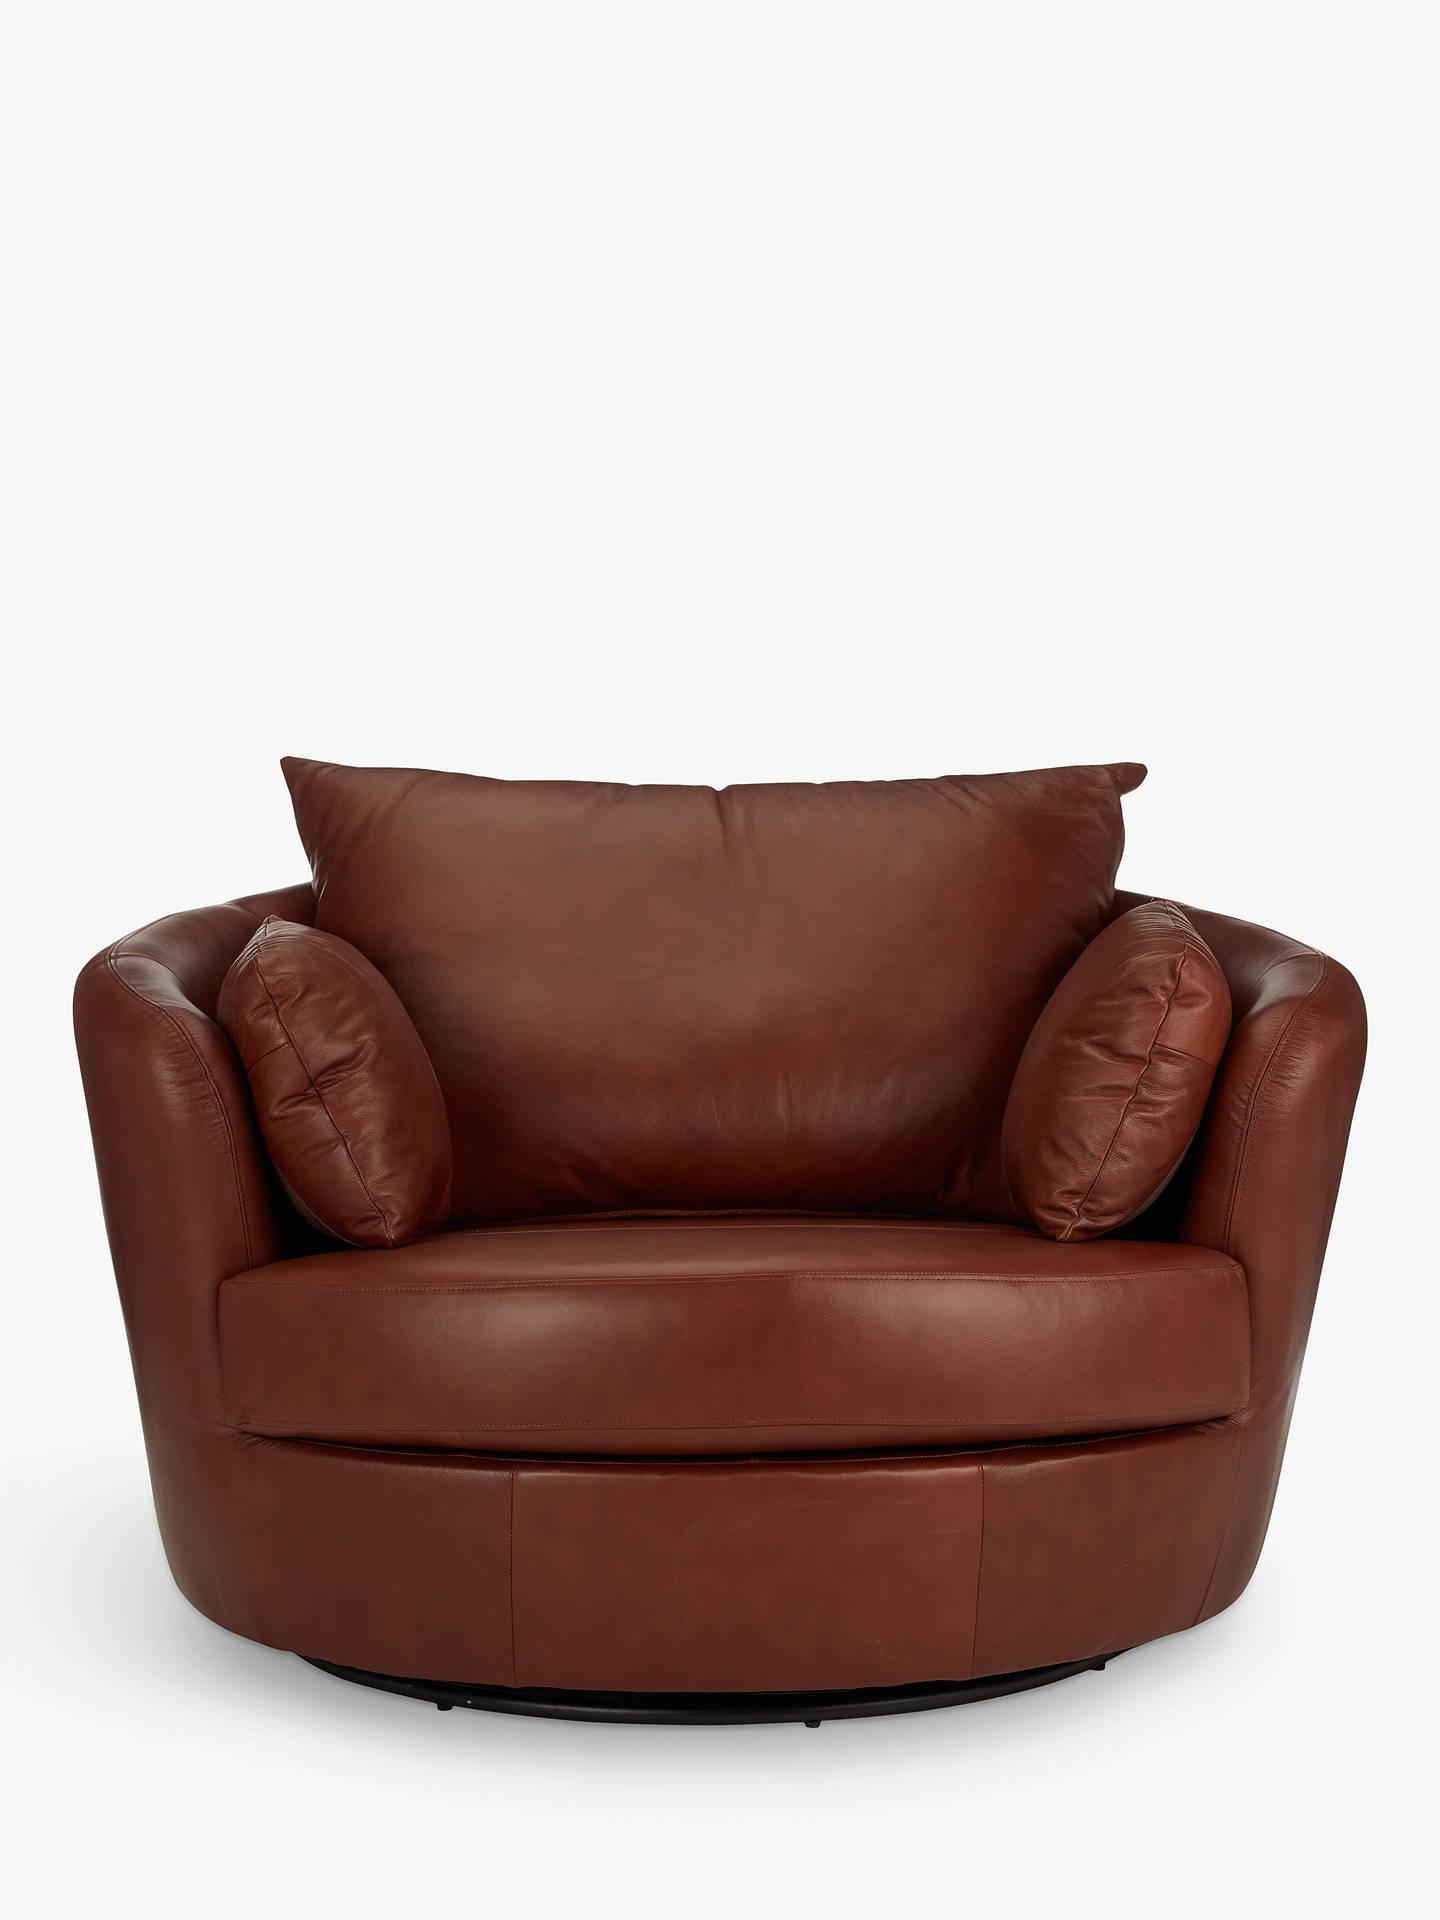 John Lewis Partners Antonio Leather Swivel Chair Contempo Castanga